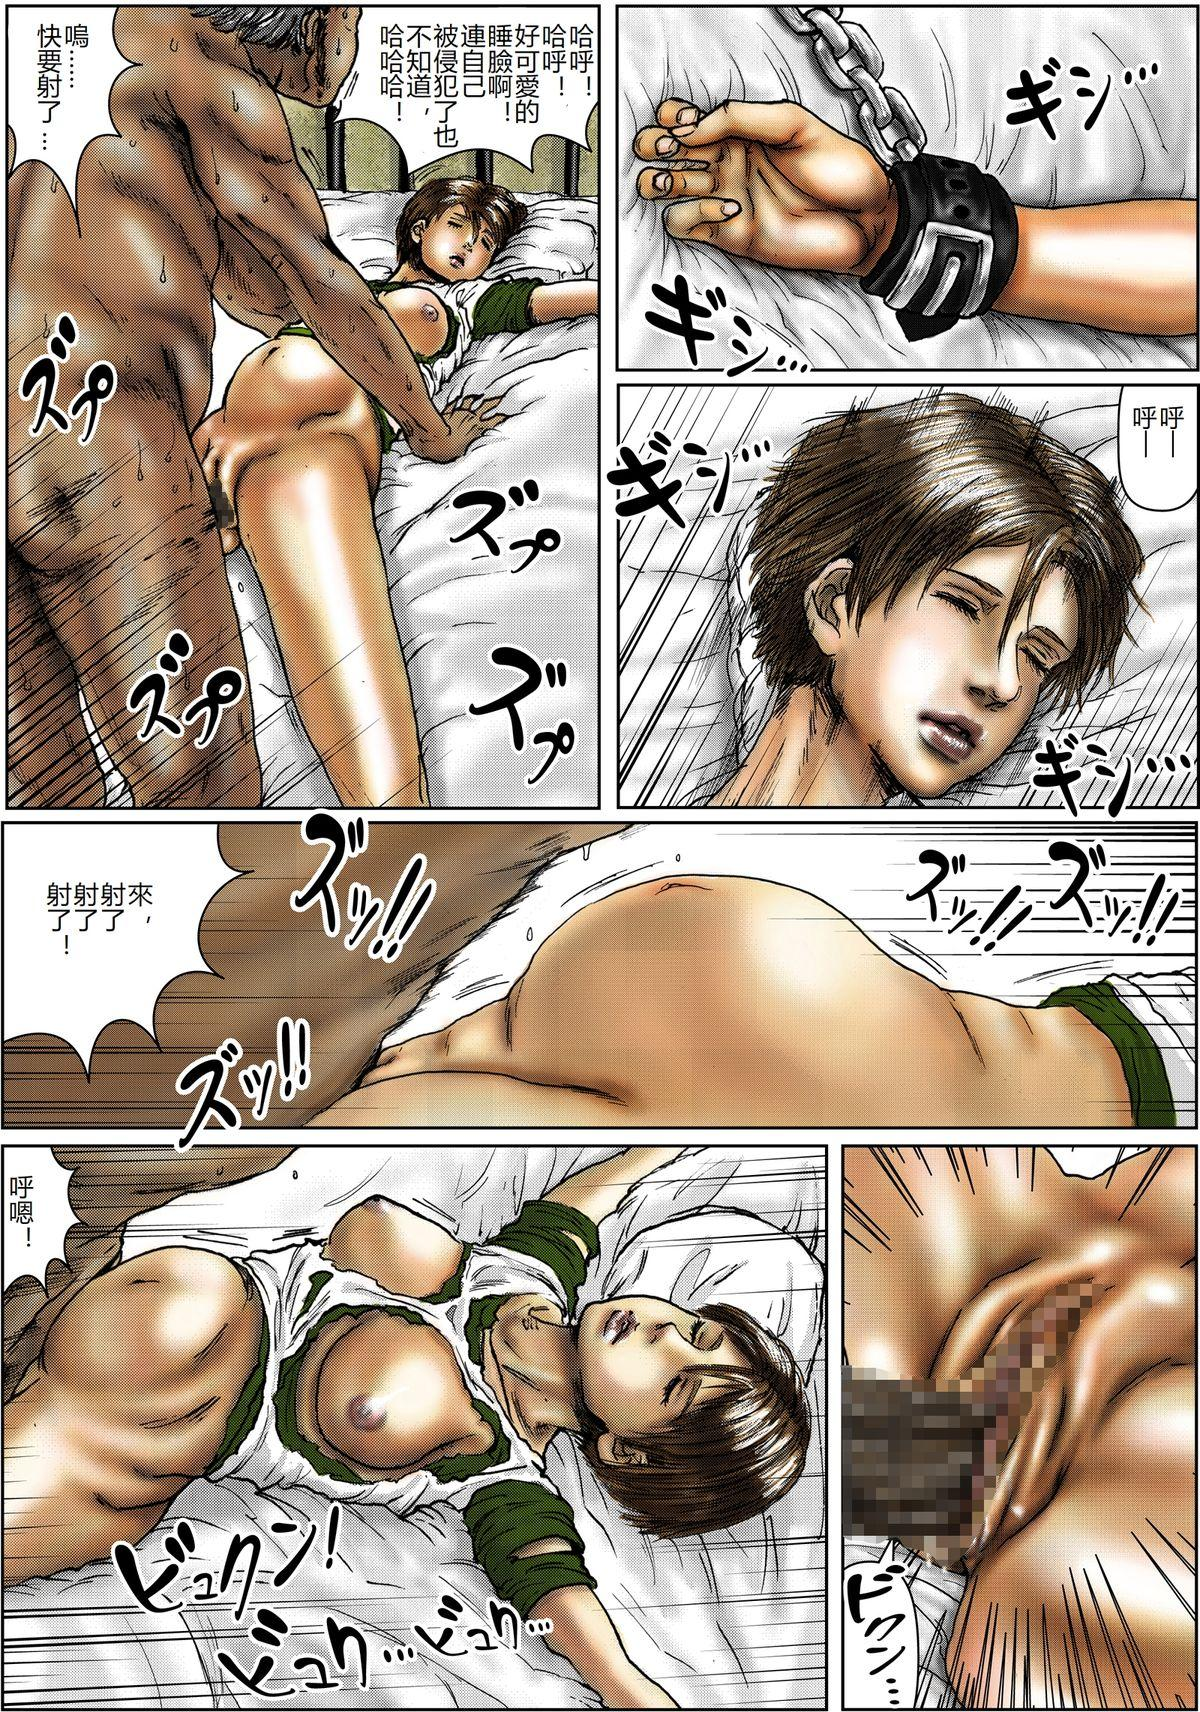 BODY HAZARD 5 Shushou Hen 21